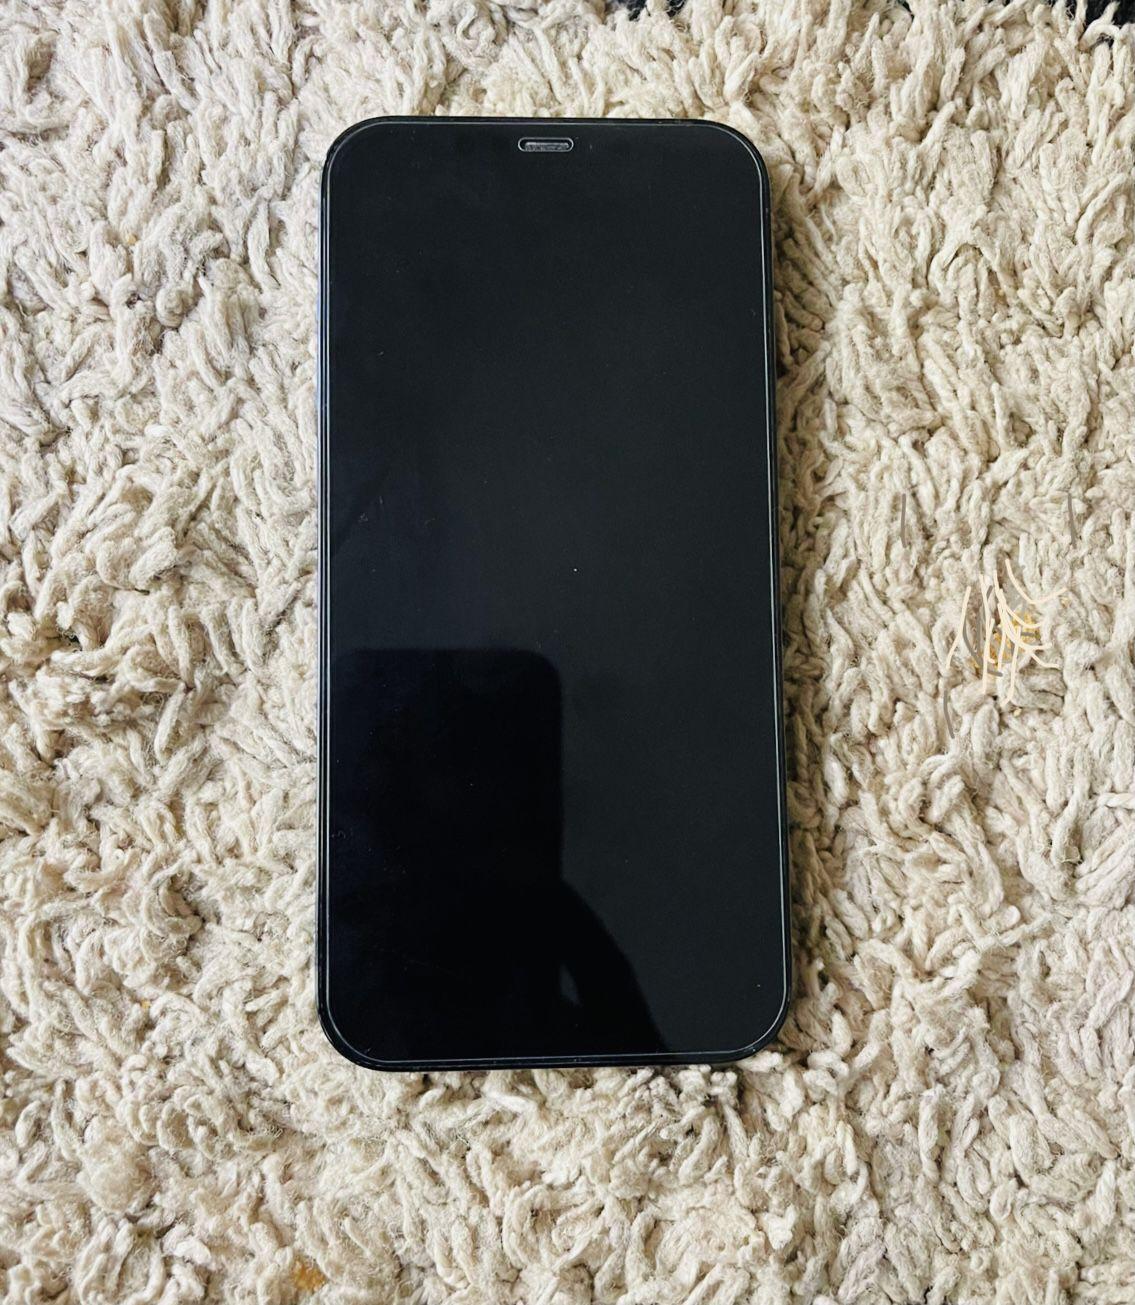 Apple iPhone 12 Pro 256GB Unlocked